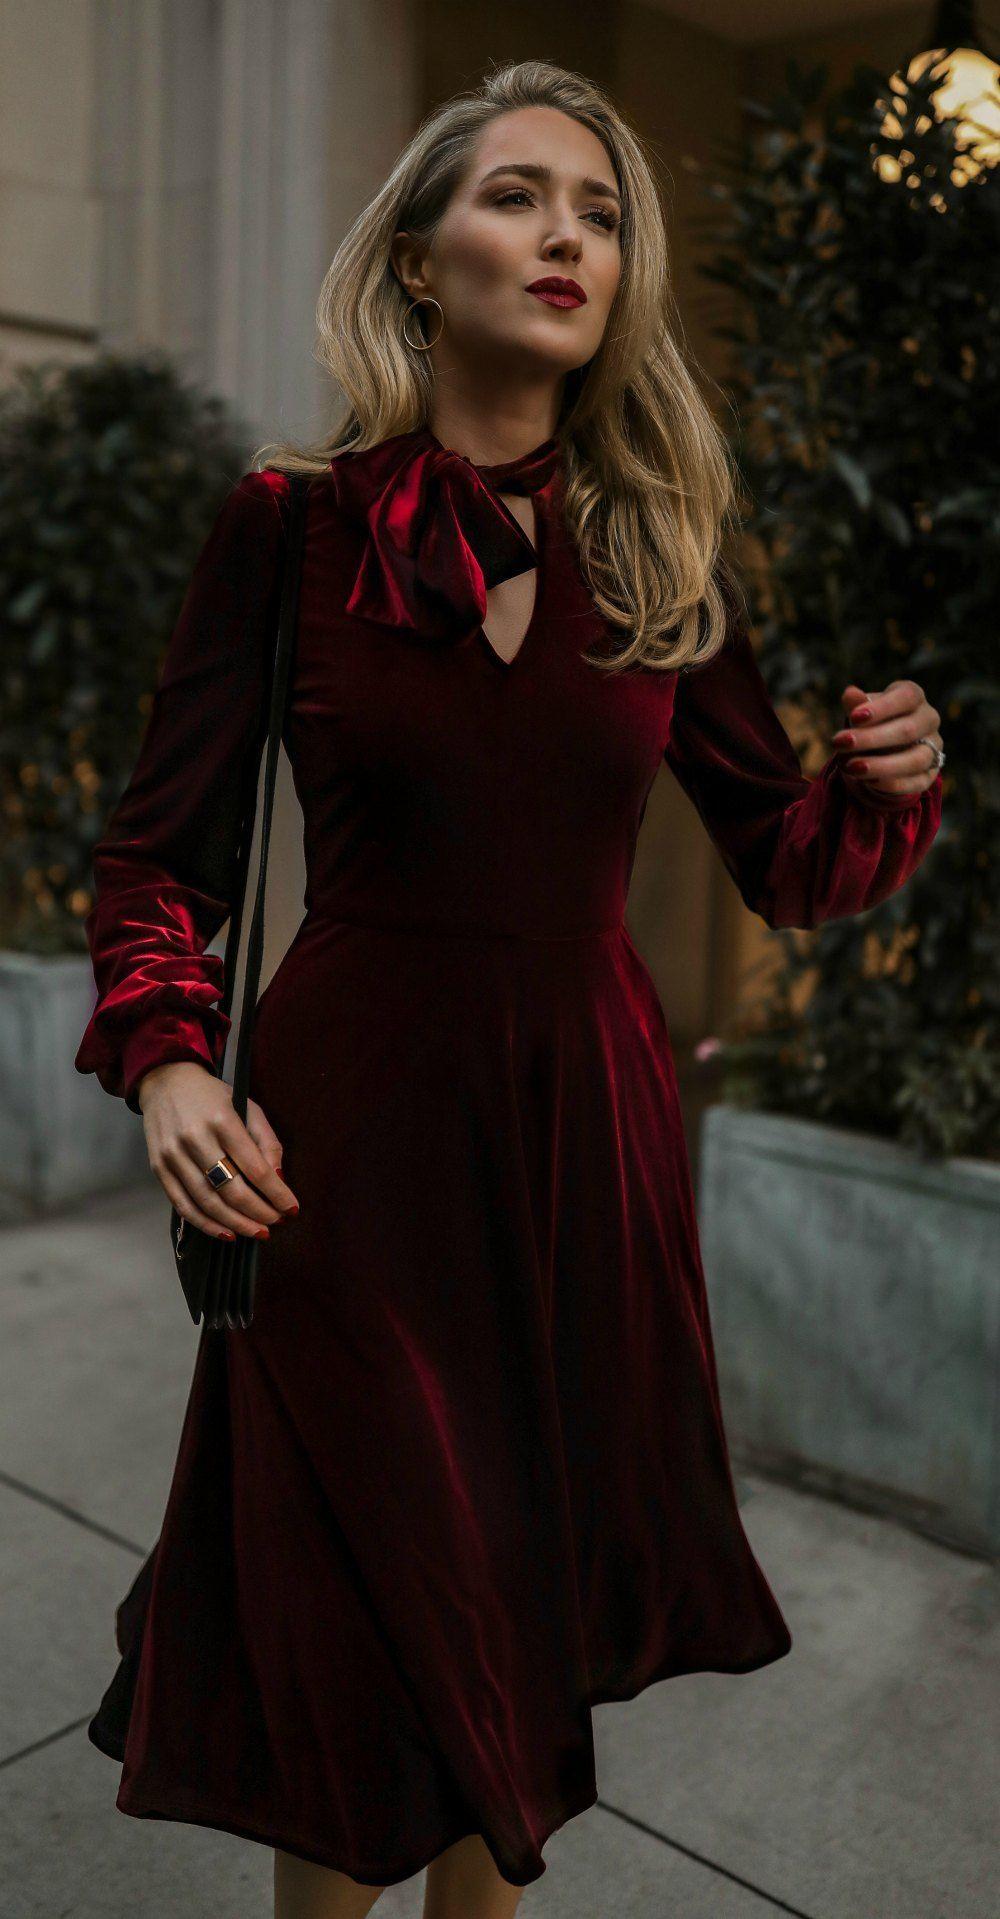 37c81827e5ba Burgundy velvet a-line dress with tie neck + long peasant sleeves, black  leather shoulder bag, gold hoops earrings Black Halo, YSL, Argento Vivo, ...